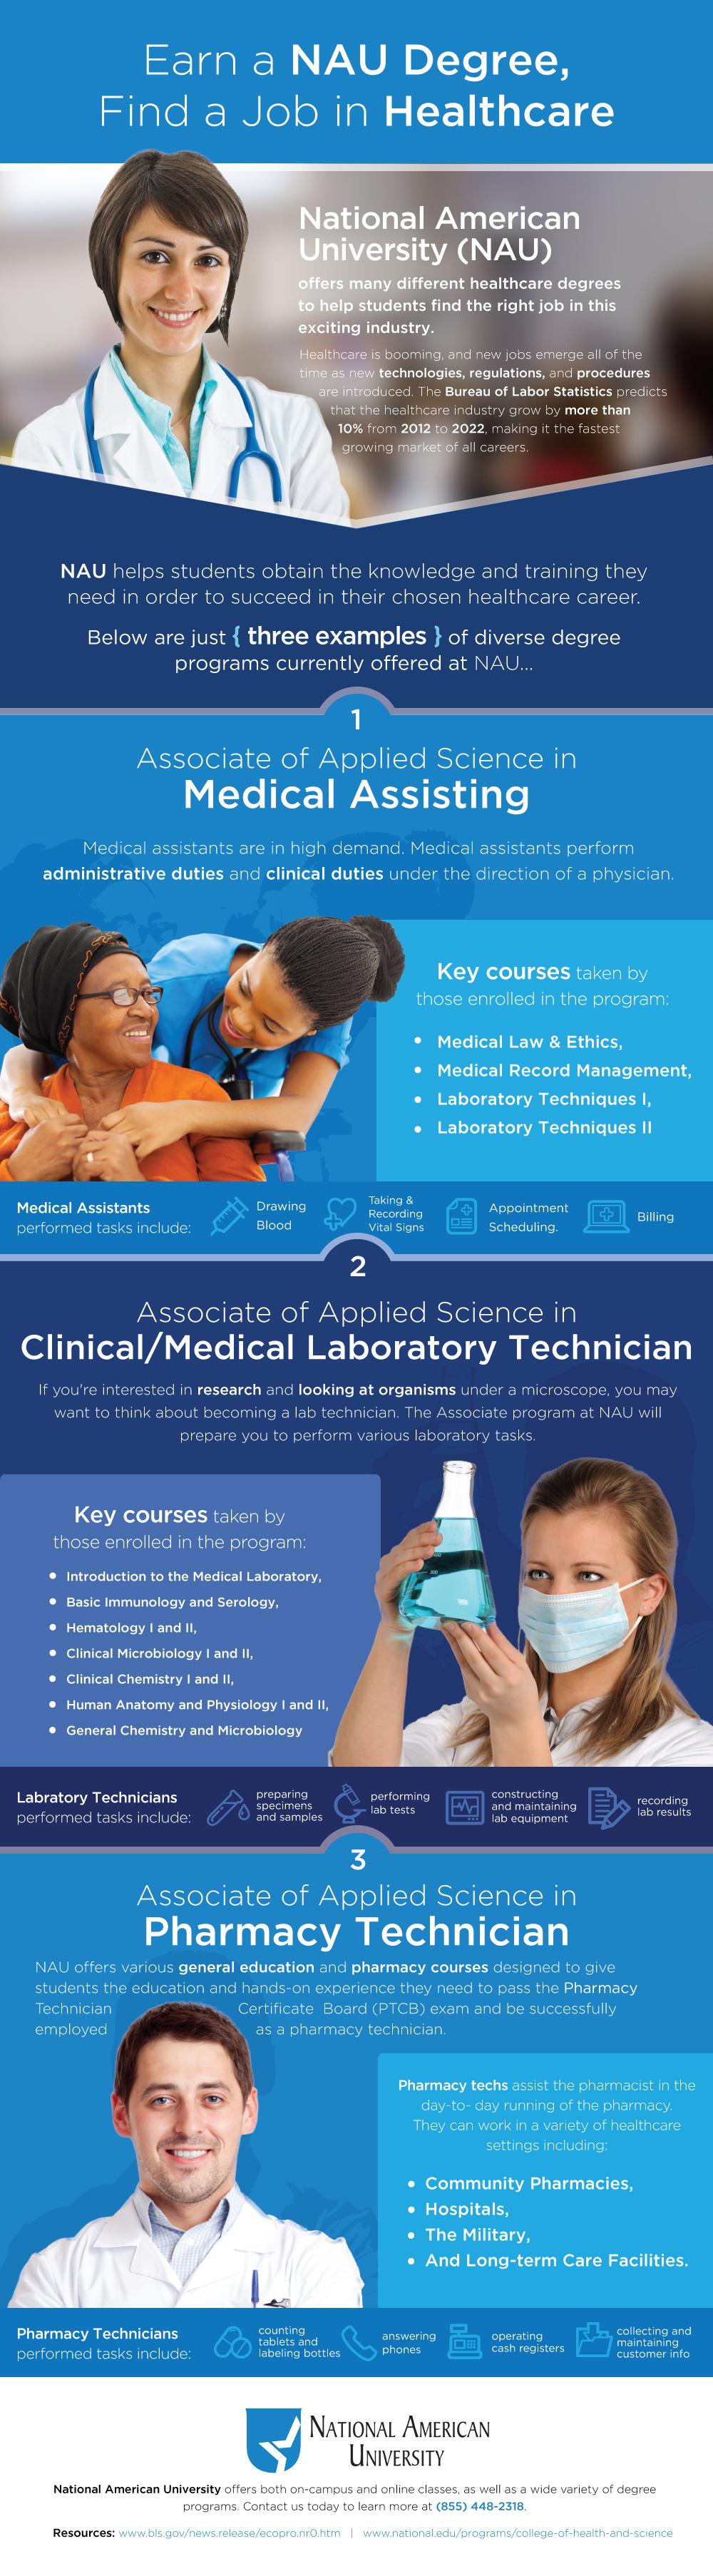 Earn a NAU Degree, Find a Job in Healthcare. FREE Info